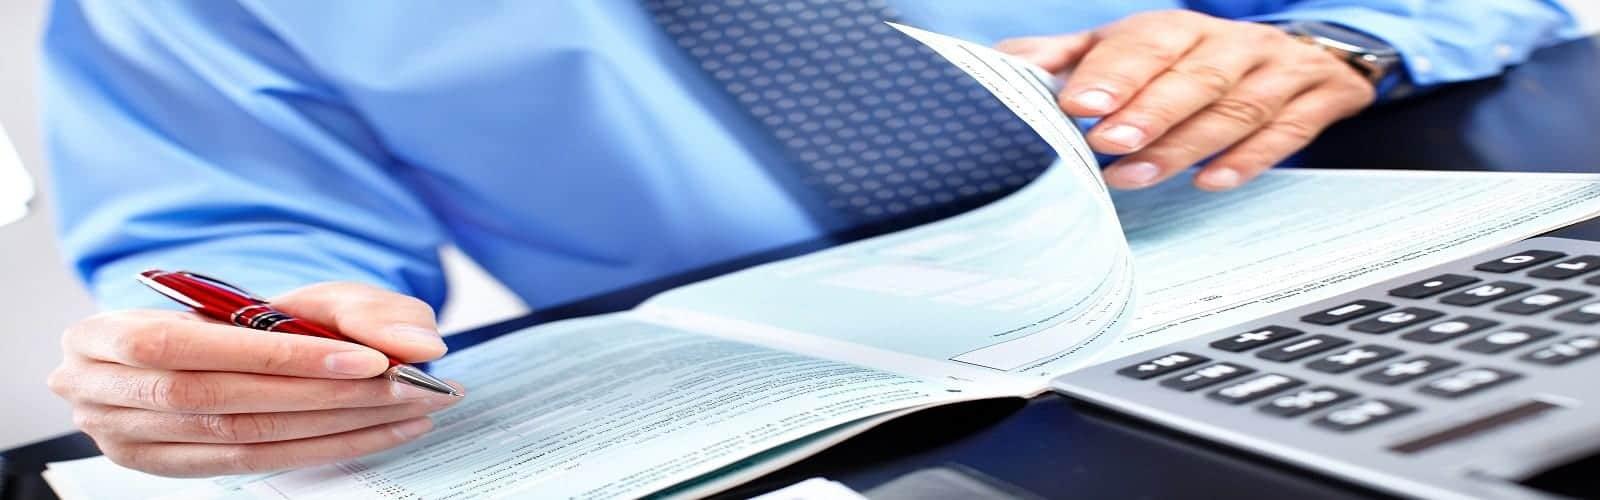 Cpfa Certificate Program In Financial Accounting Samyak Computer